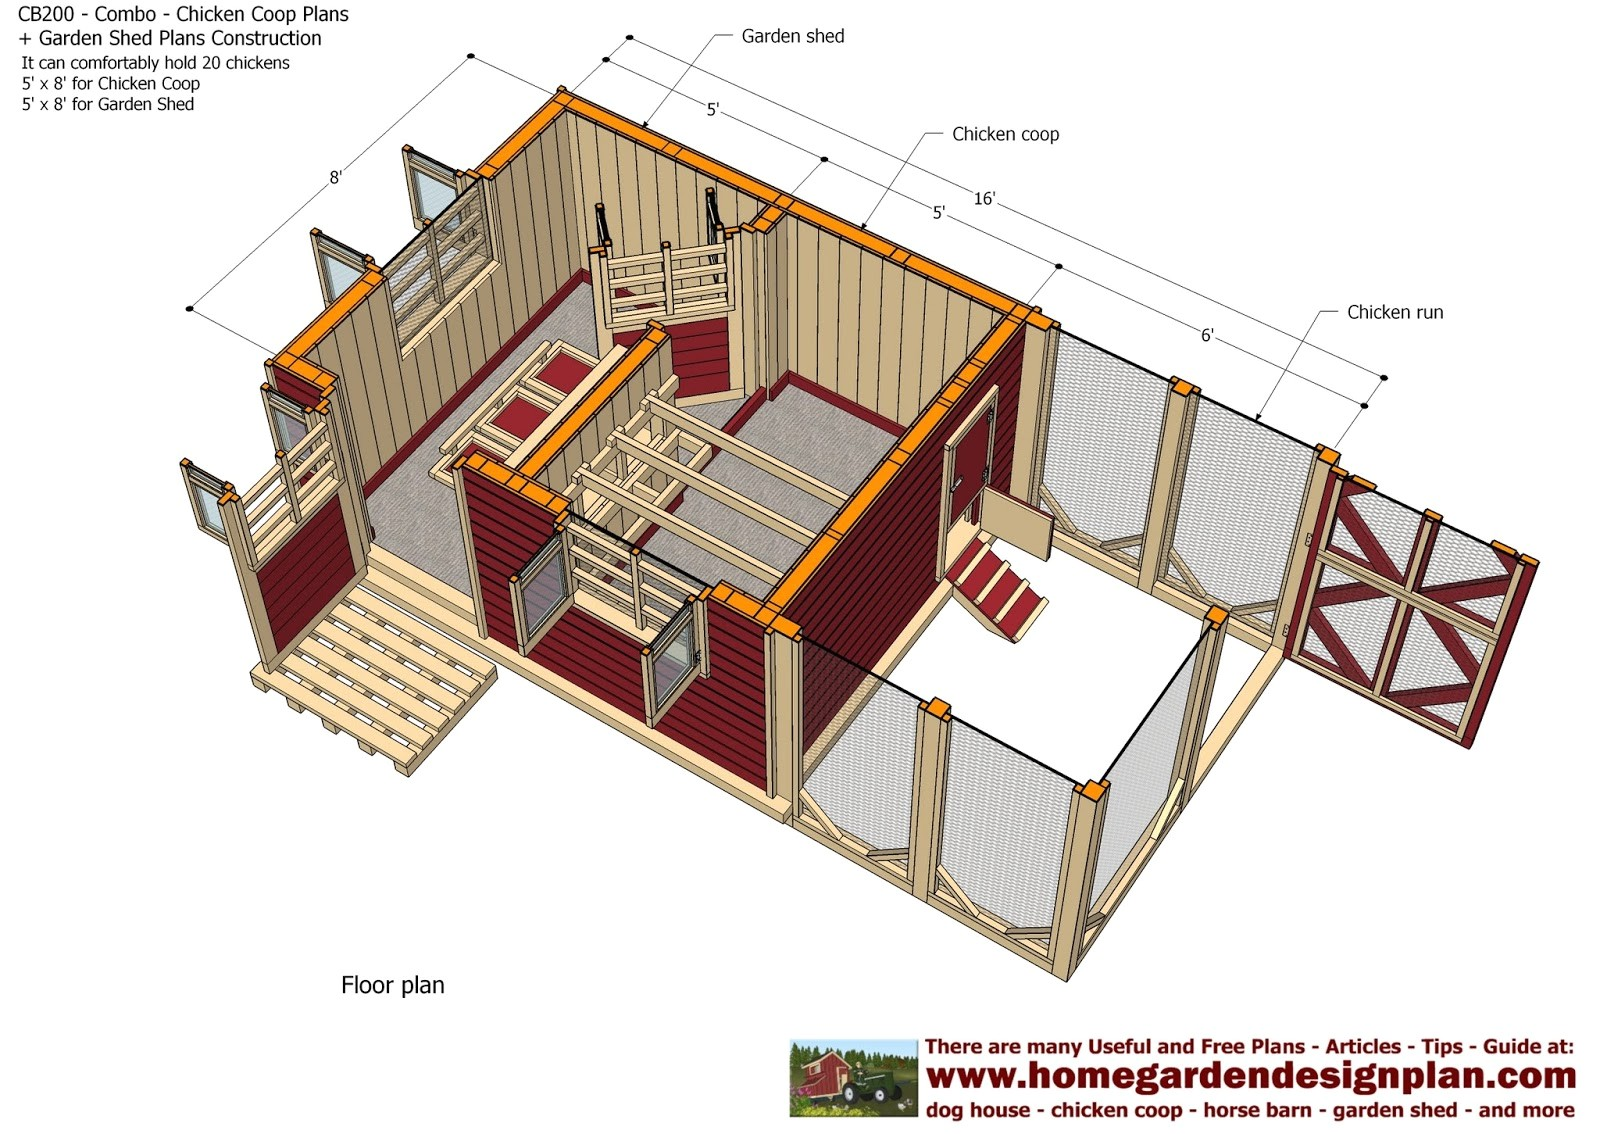 cb200 combo plans chicken coop plans